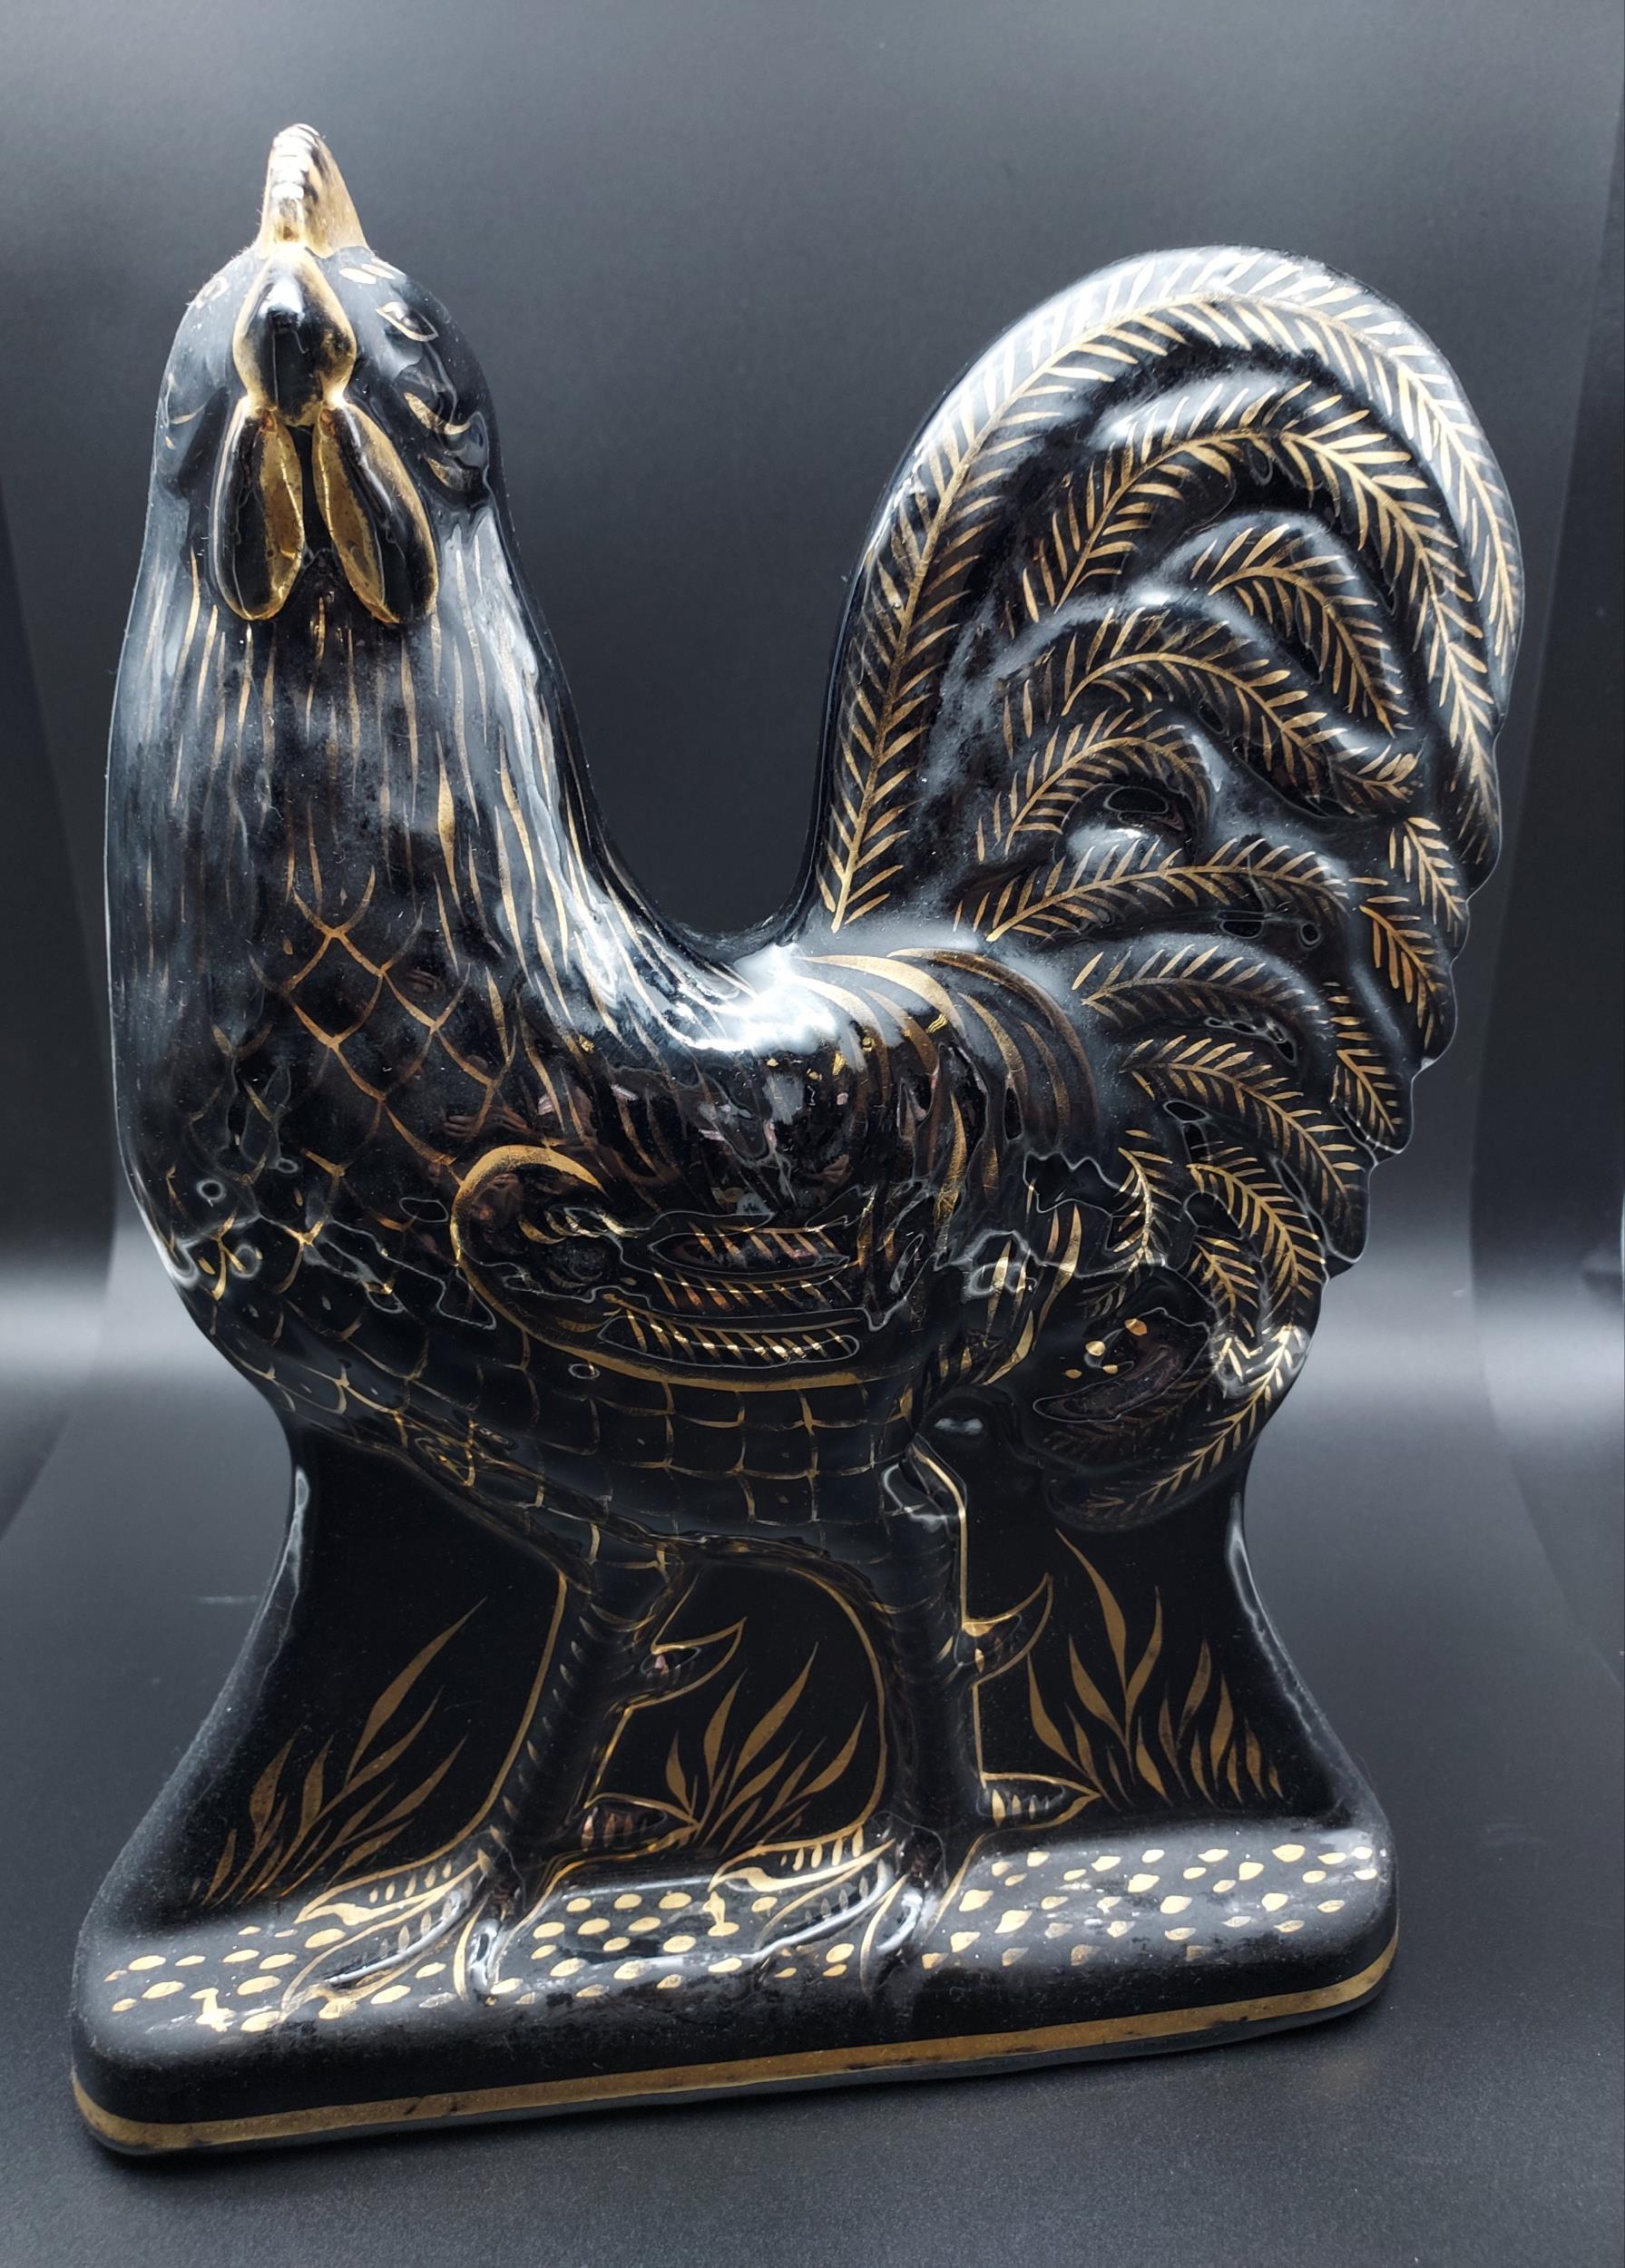 A Bo'ness pottery black lustre cockerel figurine. [31cm in height]